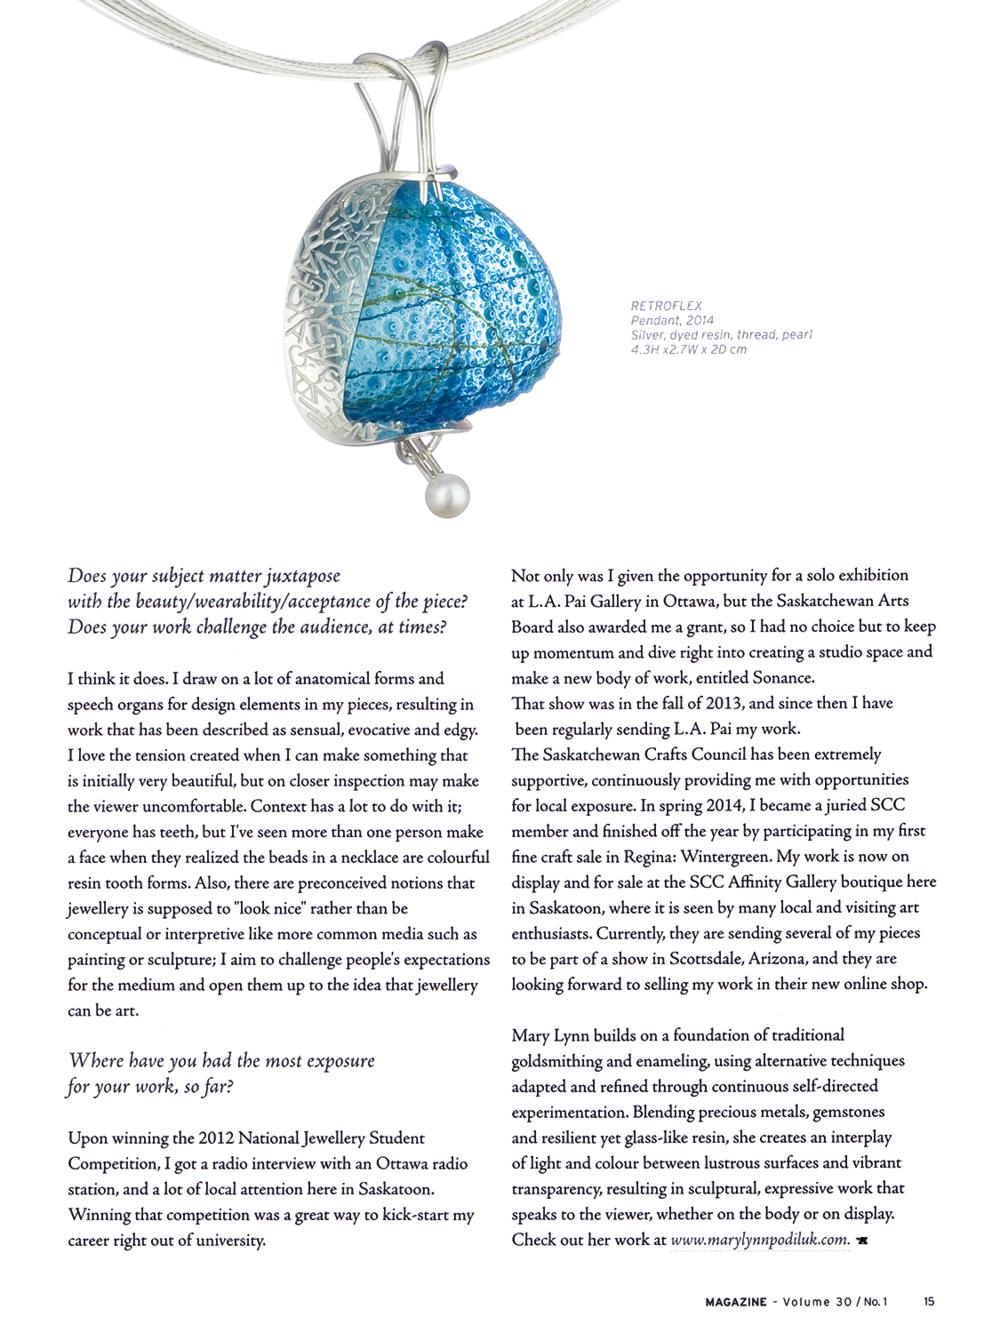 "Mary Lynn Podiluk. Interview by Tara Owen. ""In the Studio"". MAGazine: Volume 30, No. 1. 2015. 15. Print."